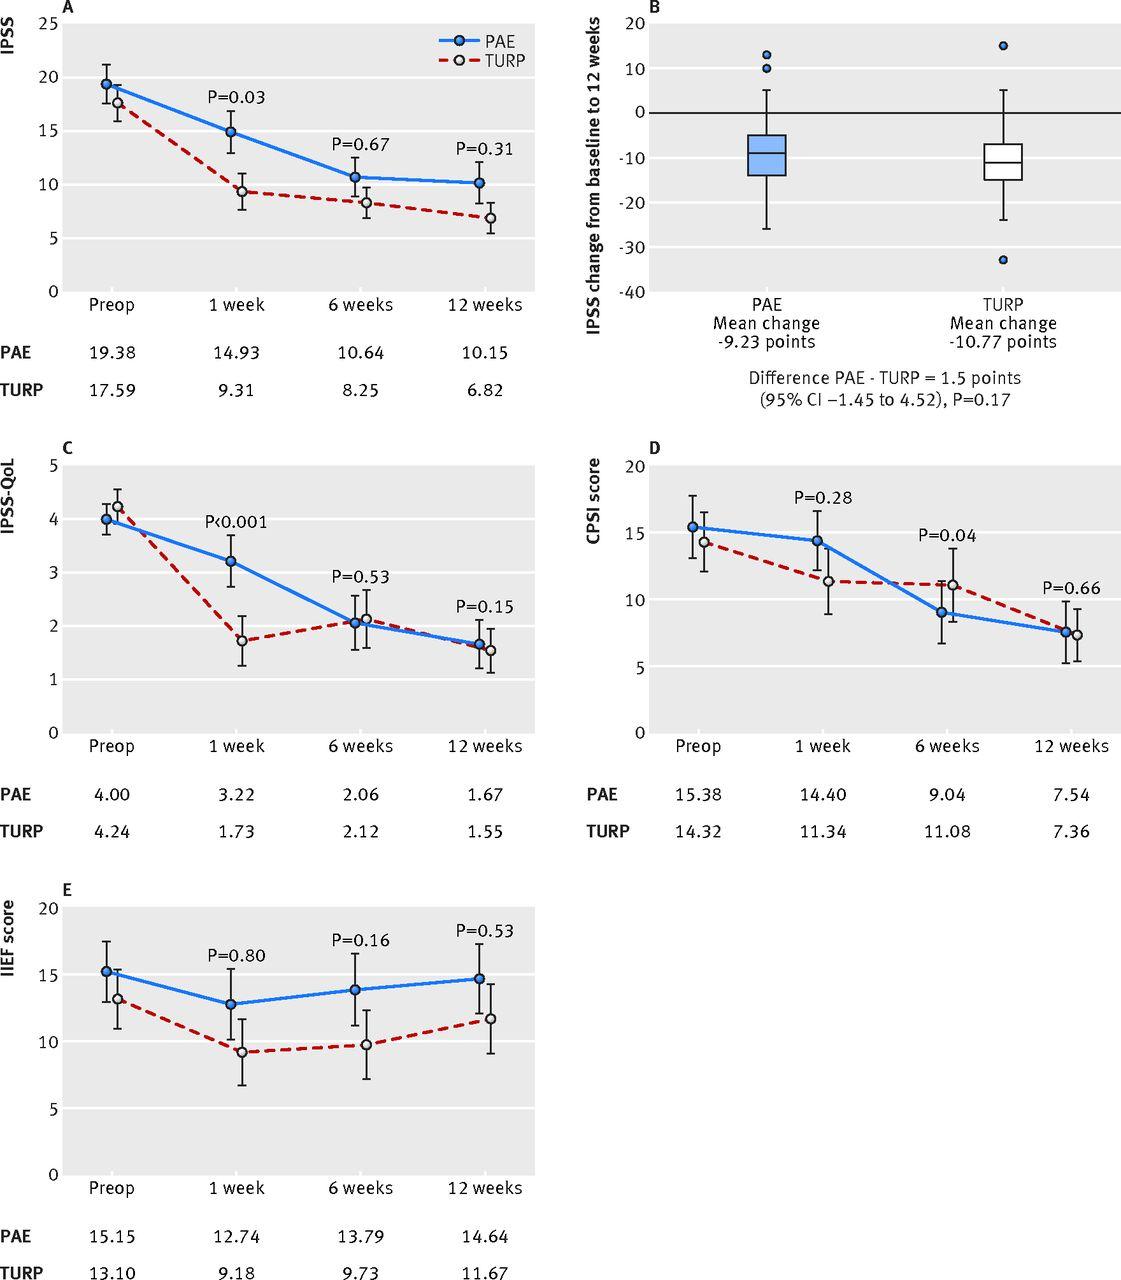 Comparison of prostatic artery embolisation (PAE) versus